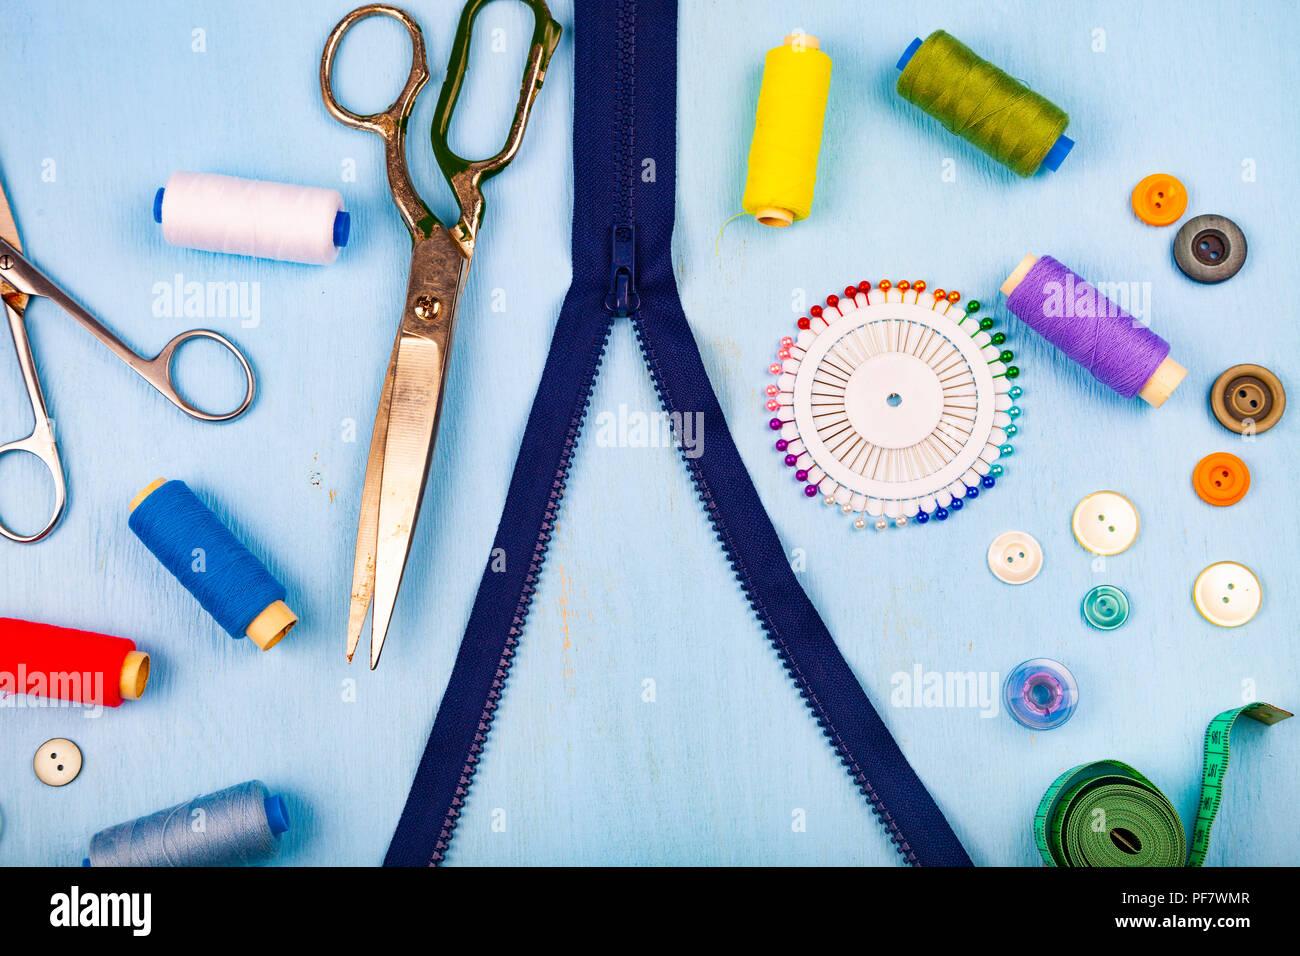 Zipper Unbuttoned y accesorios de costura sobre un fondo de madera azul. Cinta métrica, alfileres, botones, zipper, tijeras e hilo. Foto de stock